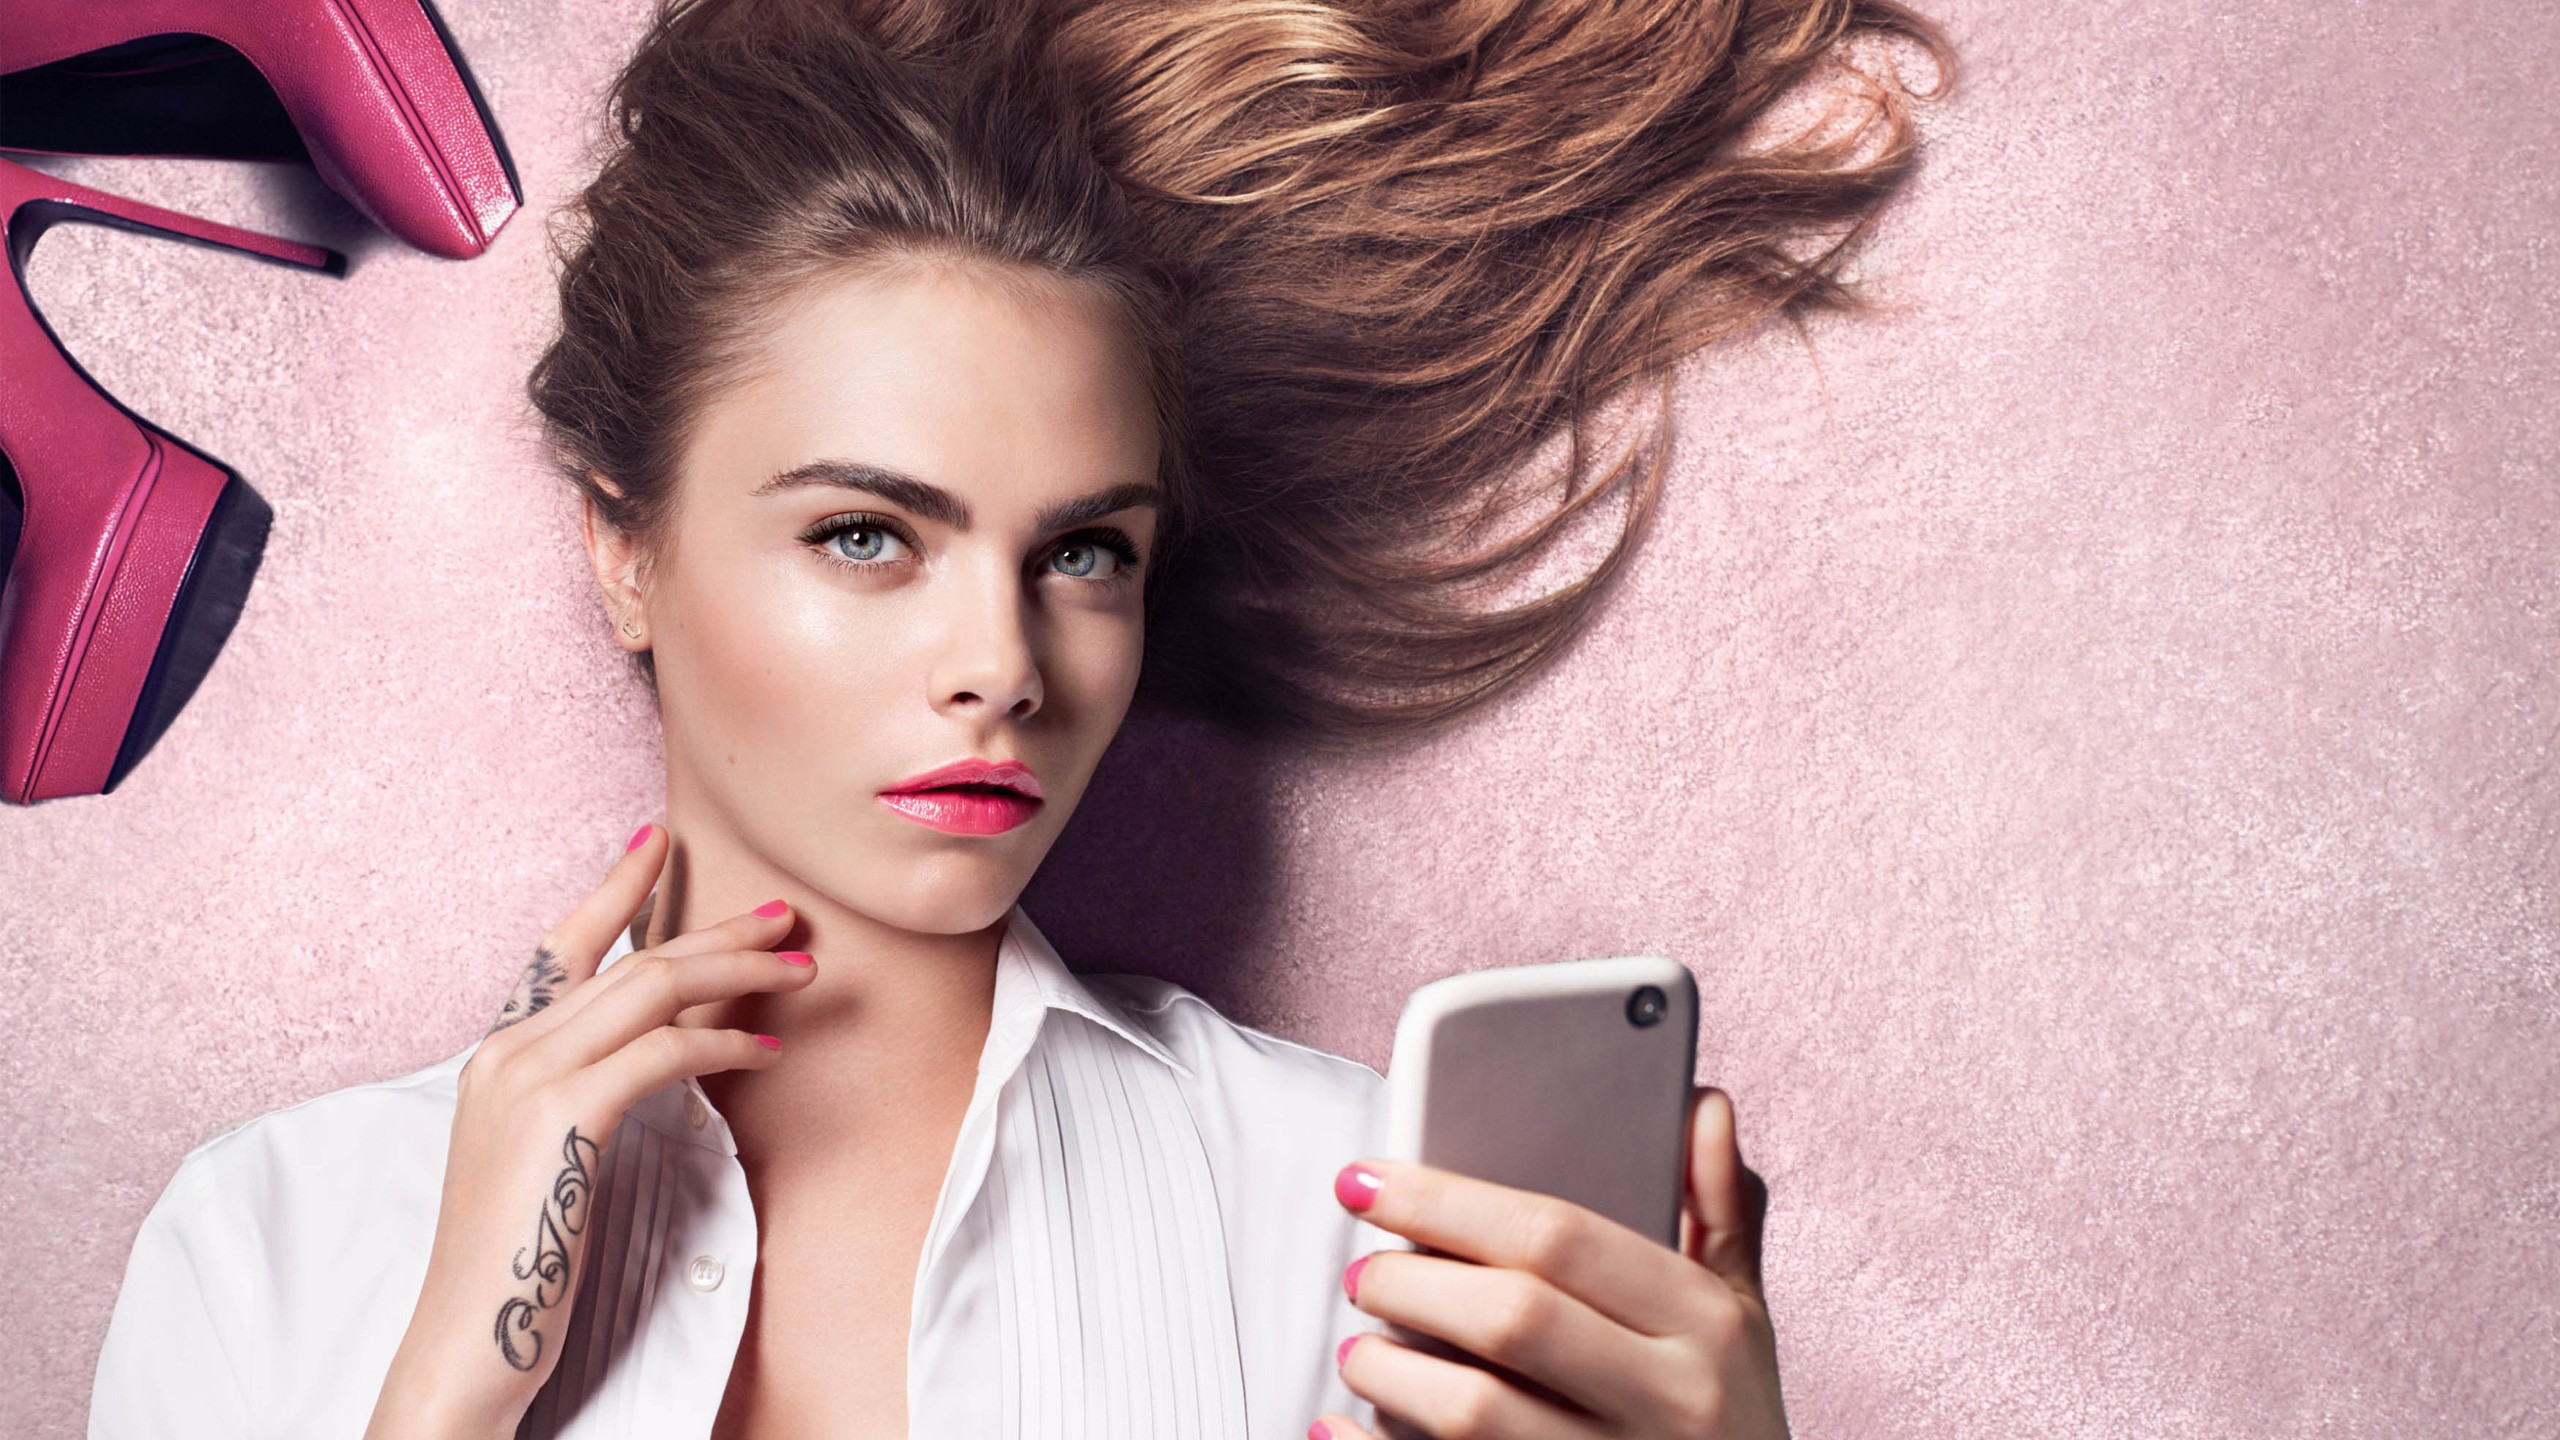 cara delevingne sexy wallpaper background 64682